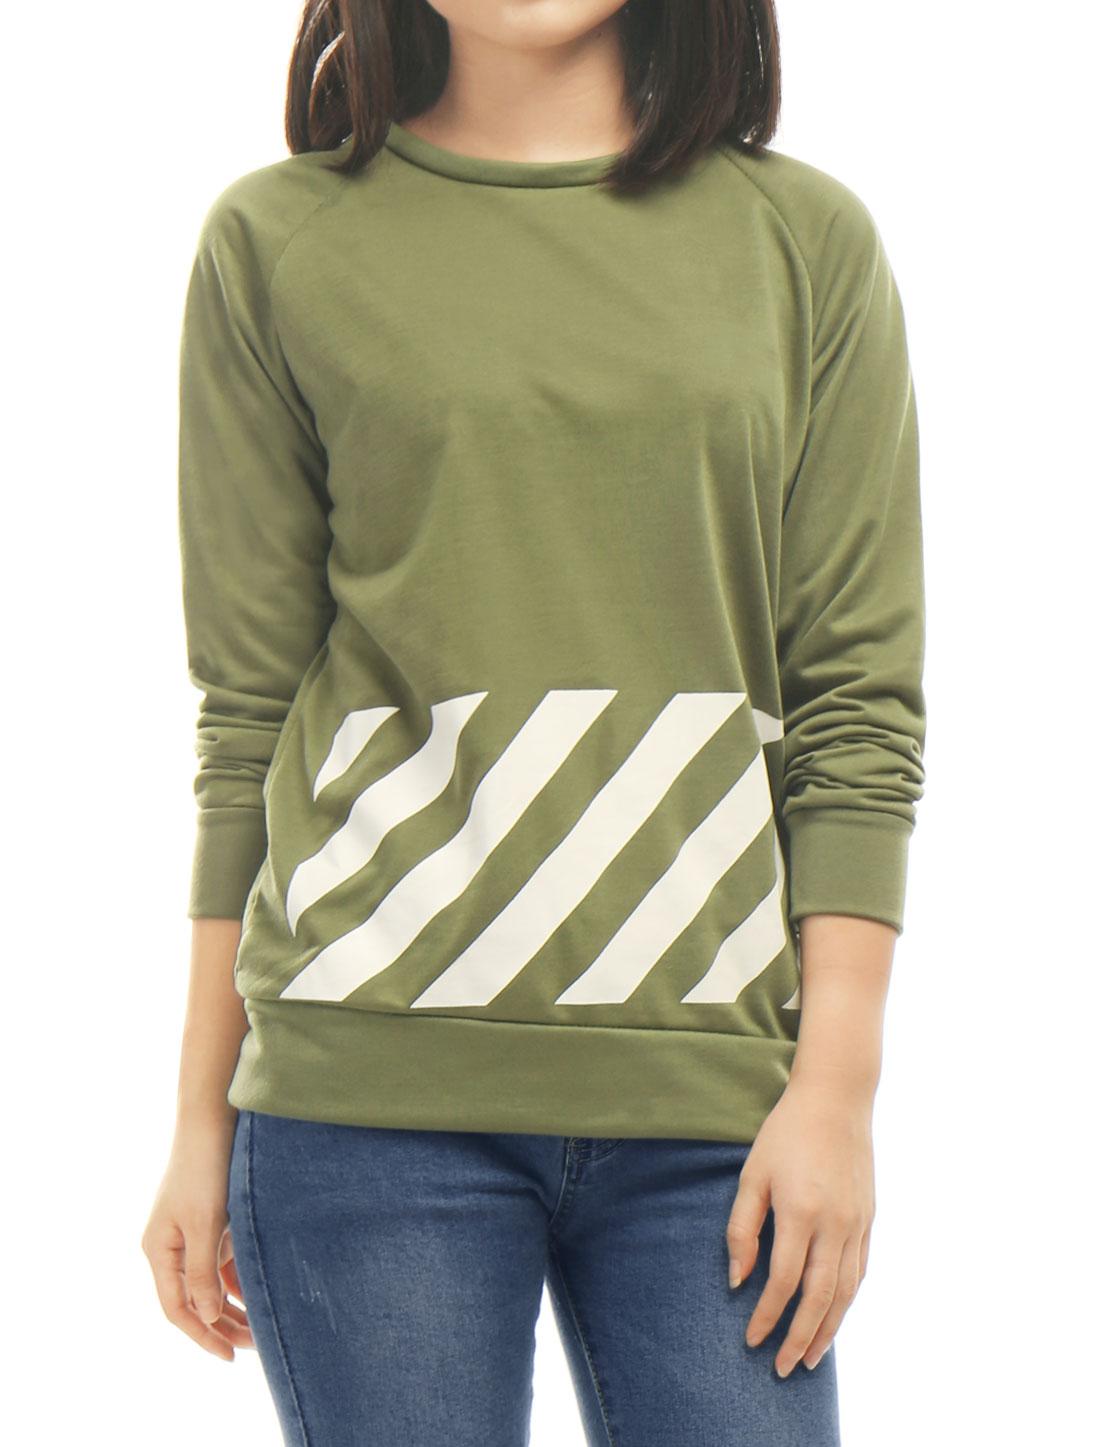 Women-Crew-Neck-Raglan-Long-Sleeves-Stripes-PU-Panel-T-shirt